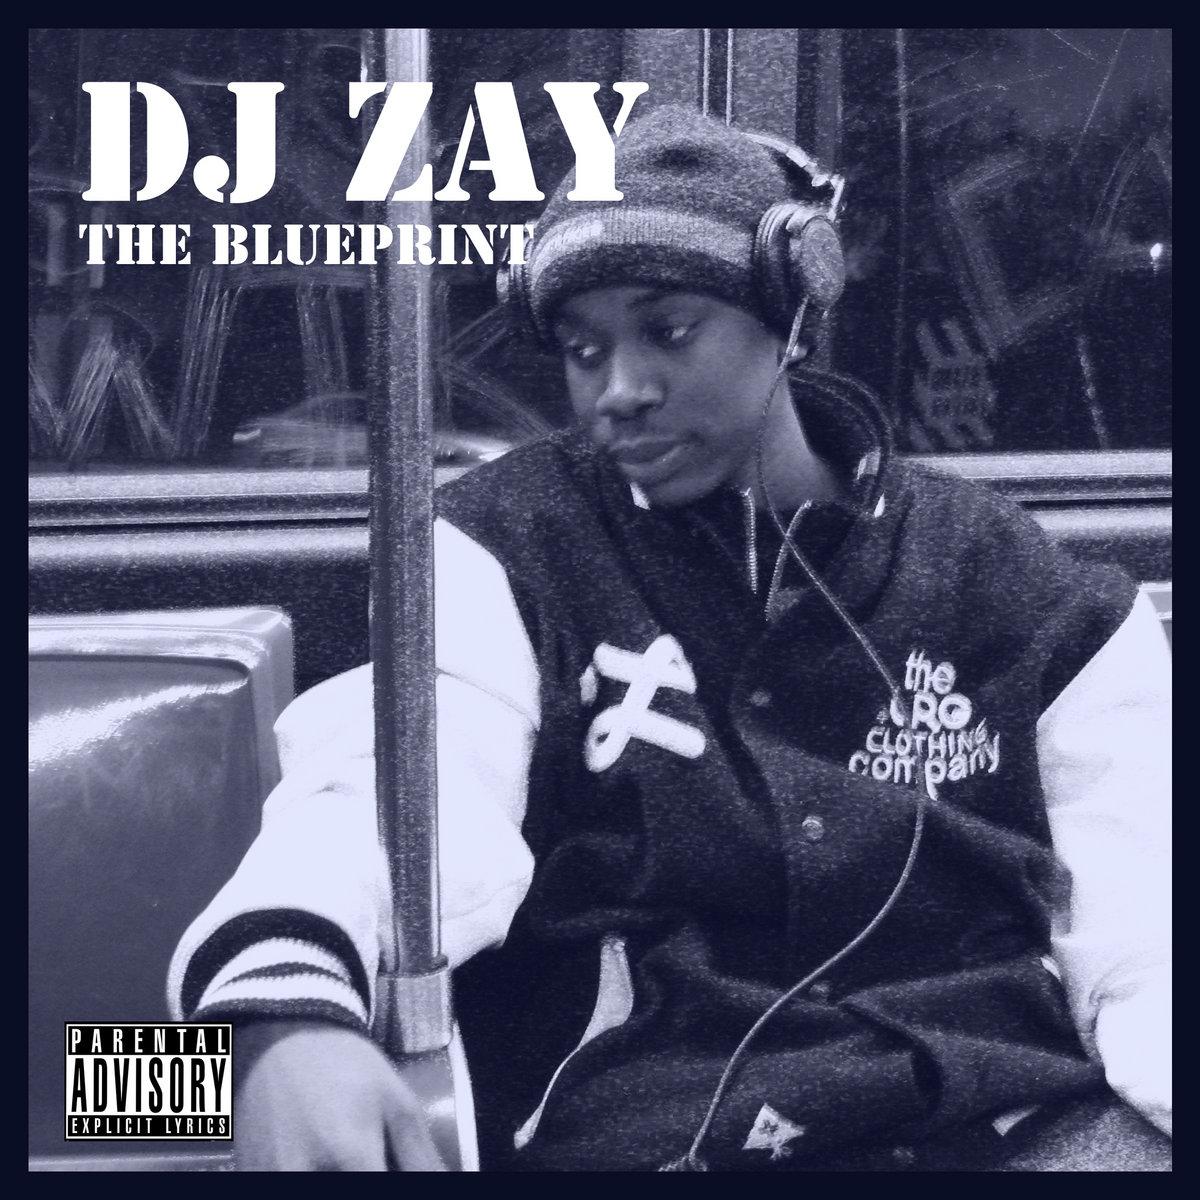 The rulers back dj zay remix dj zay from the blueprint a fair alternative by dj zay malvernweather Choice Image